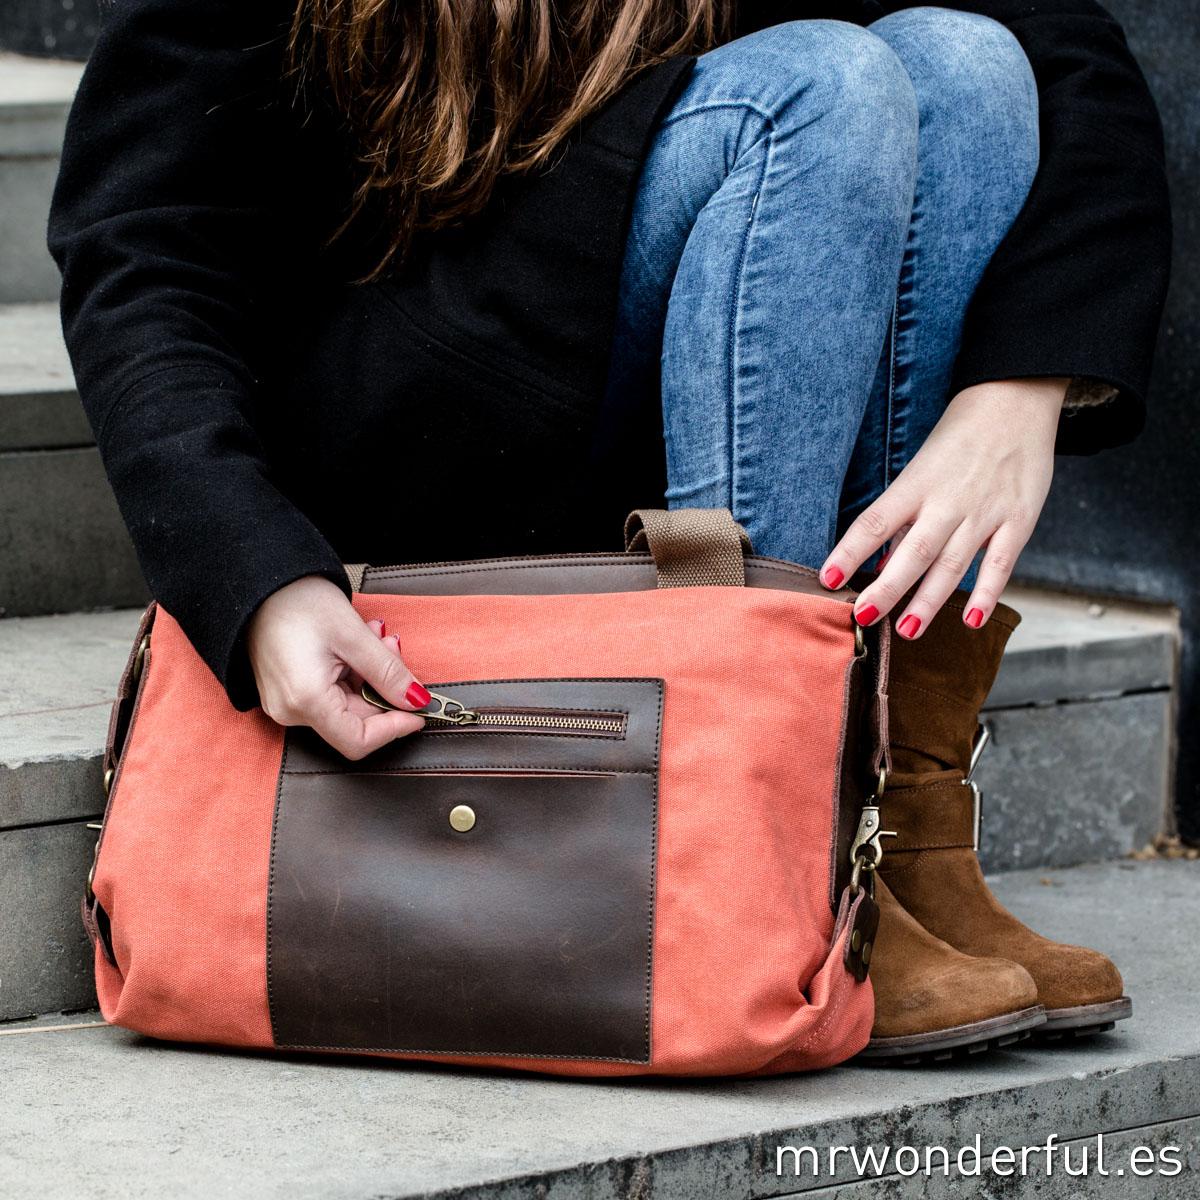 mrwonderful_bags_W2096-Corail-59